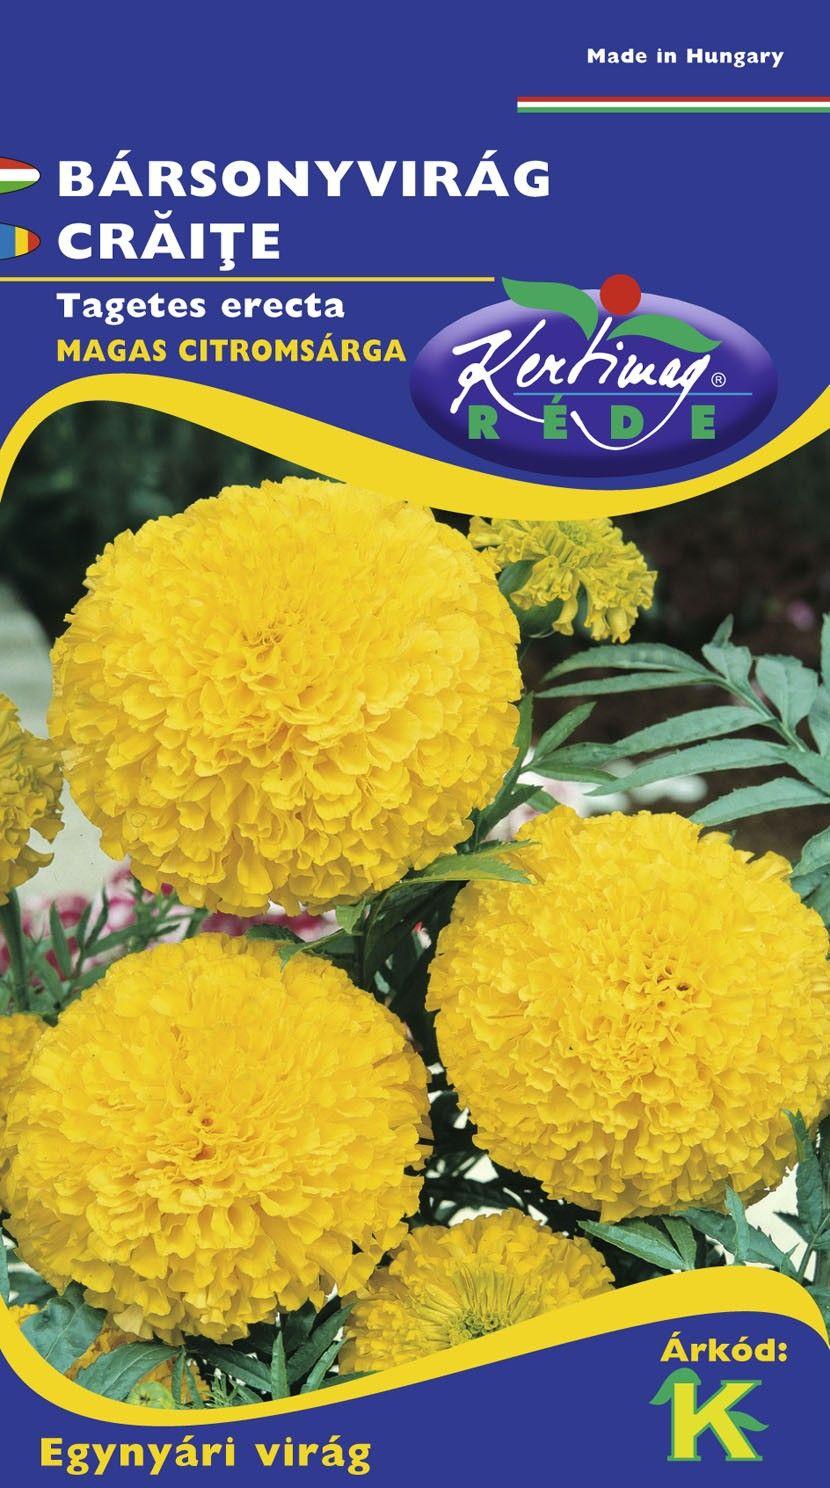 Seminte de Craite duble inalte Yellow - KM - Tagetes erecta